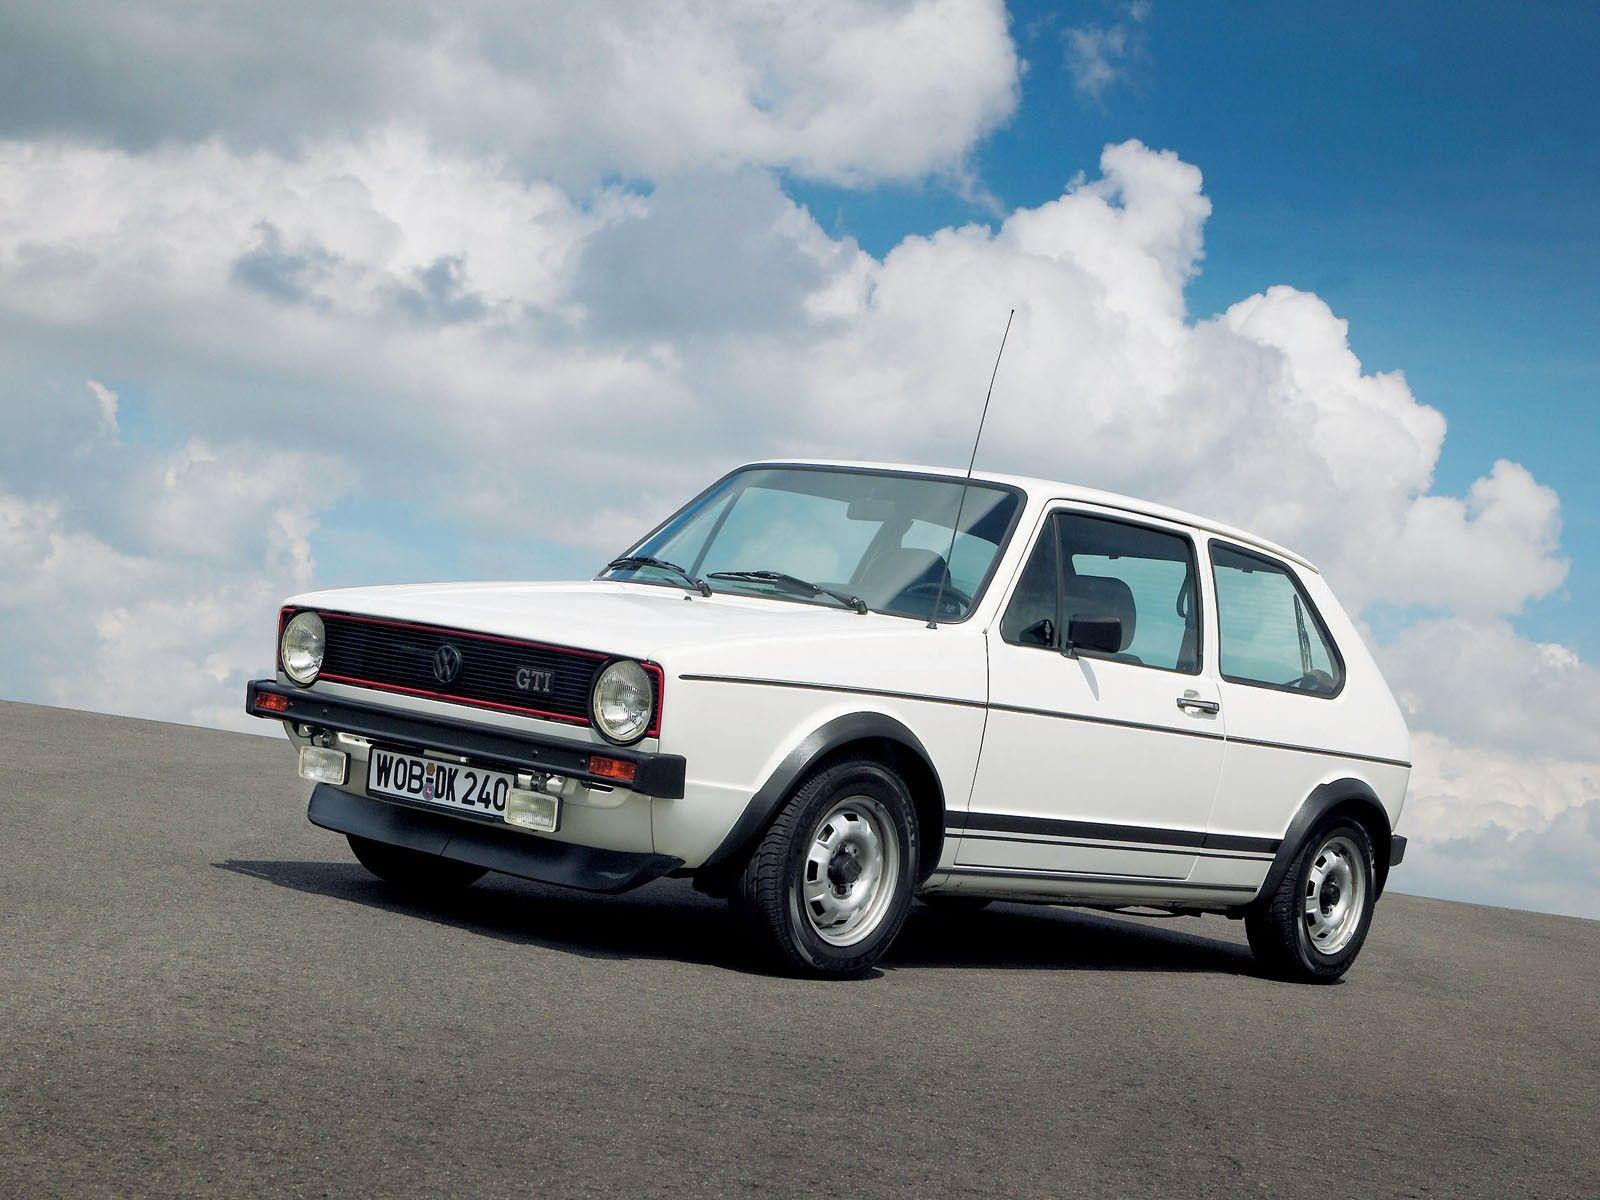 Mk1 Golf Gti The Original And Best Volkswagen Golf Volkswagen Gti Volkswagen Golf Mk1